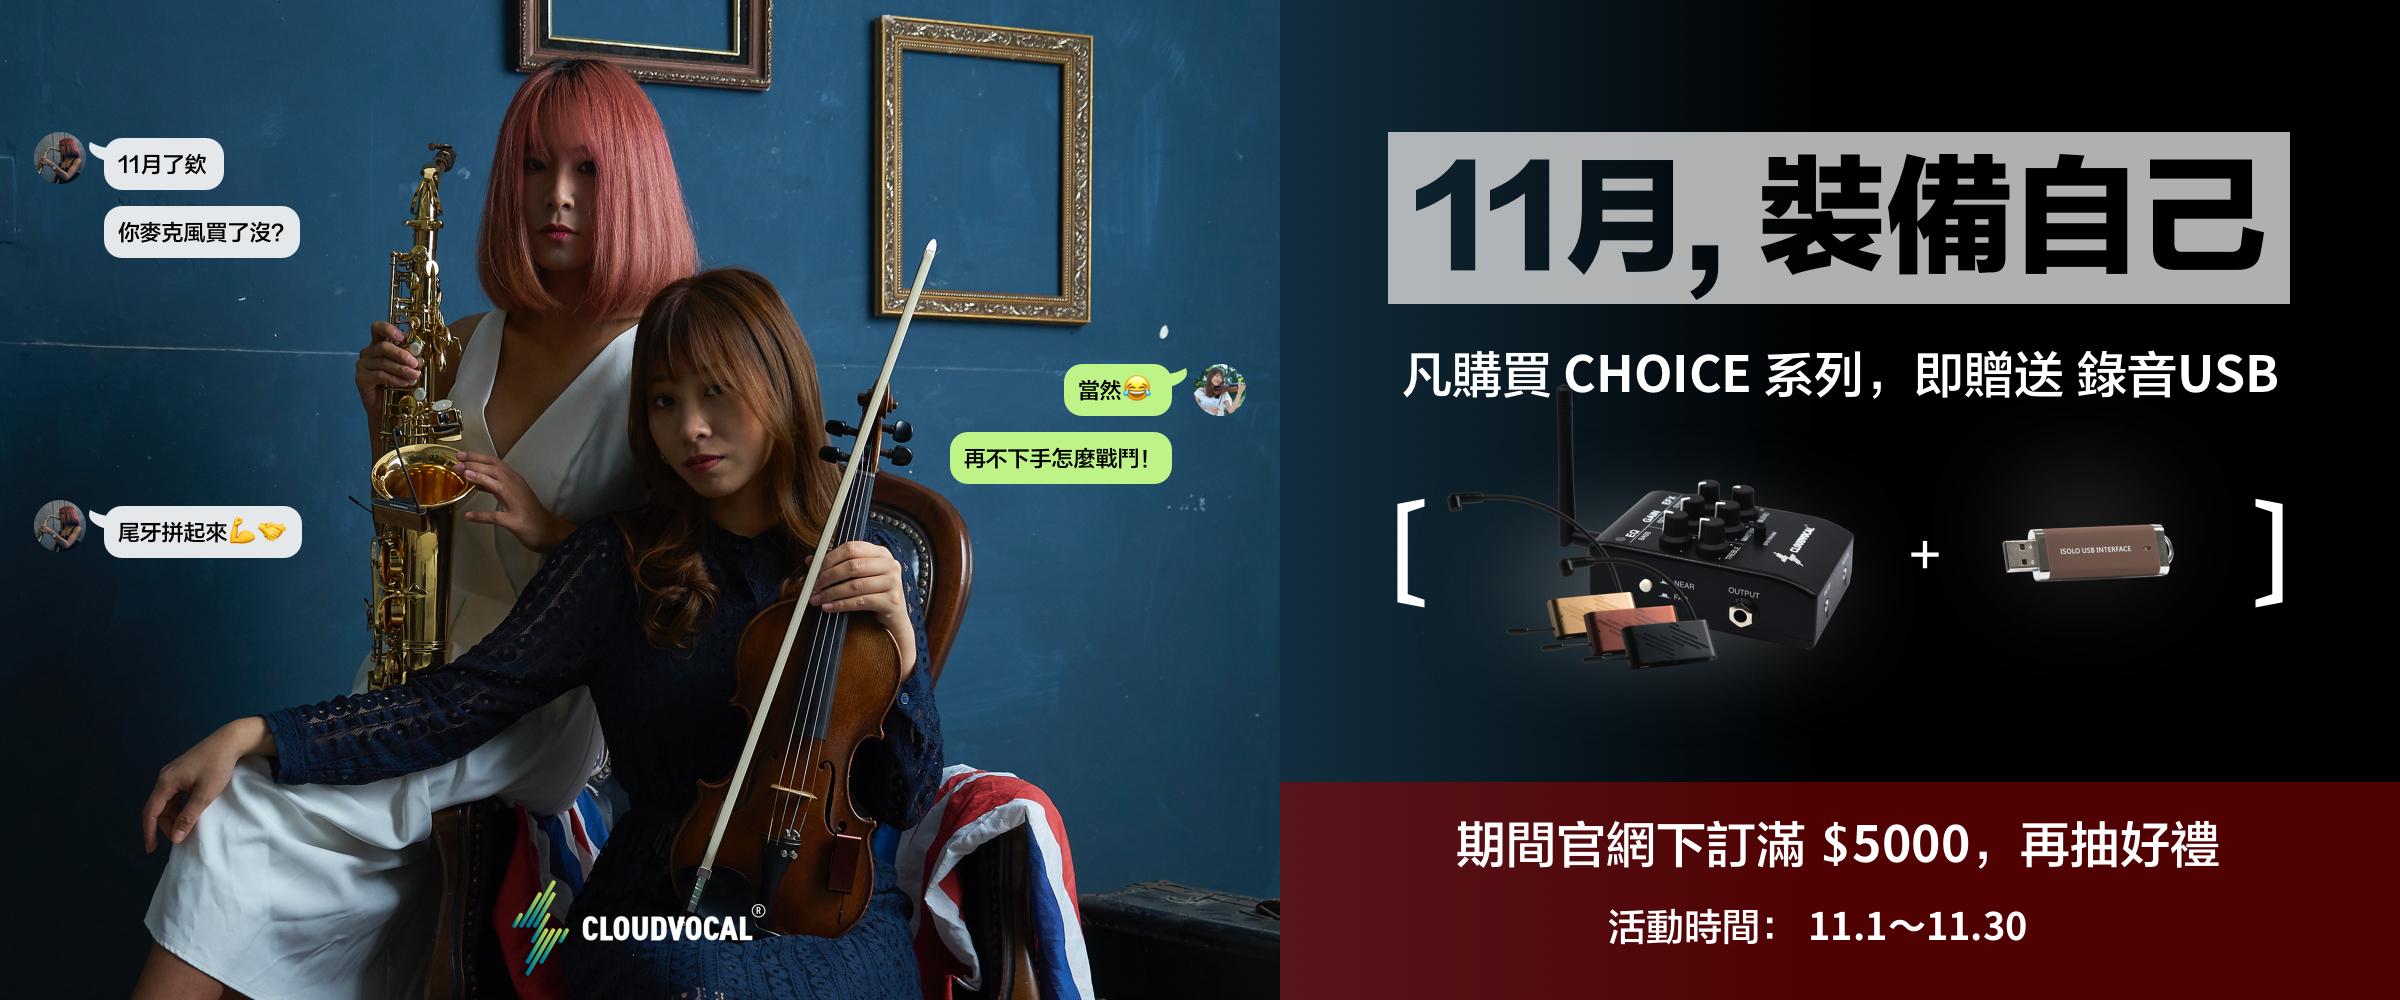 isolo,choice,麥克風,1111,促銷,11月